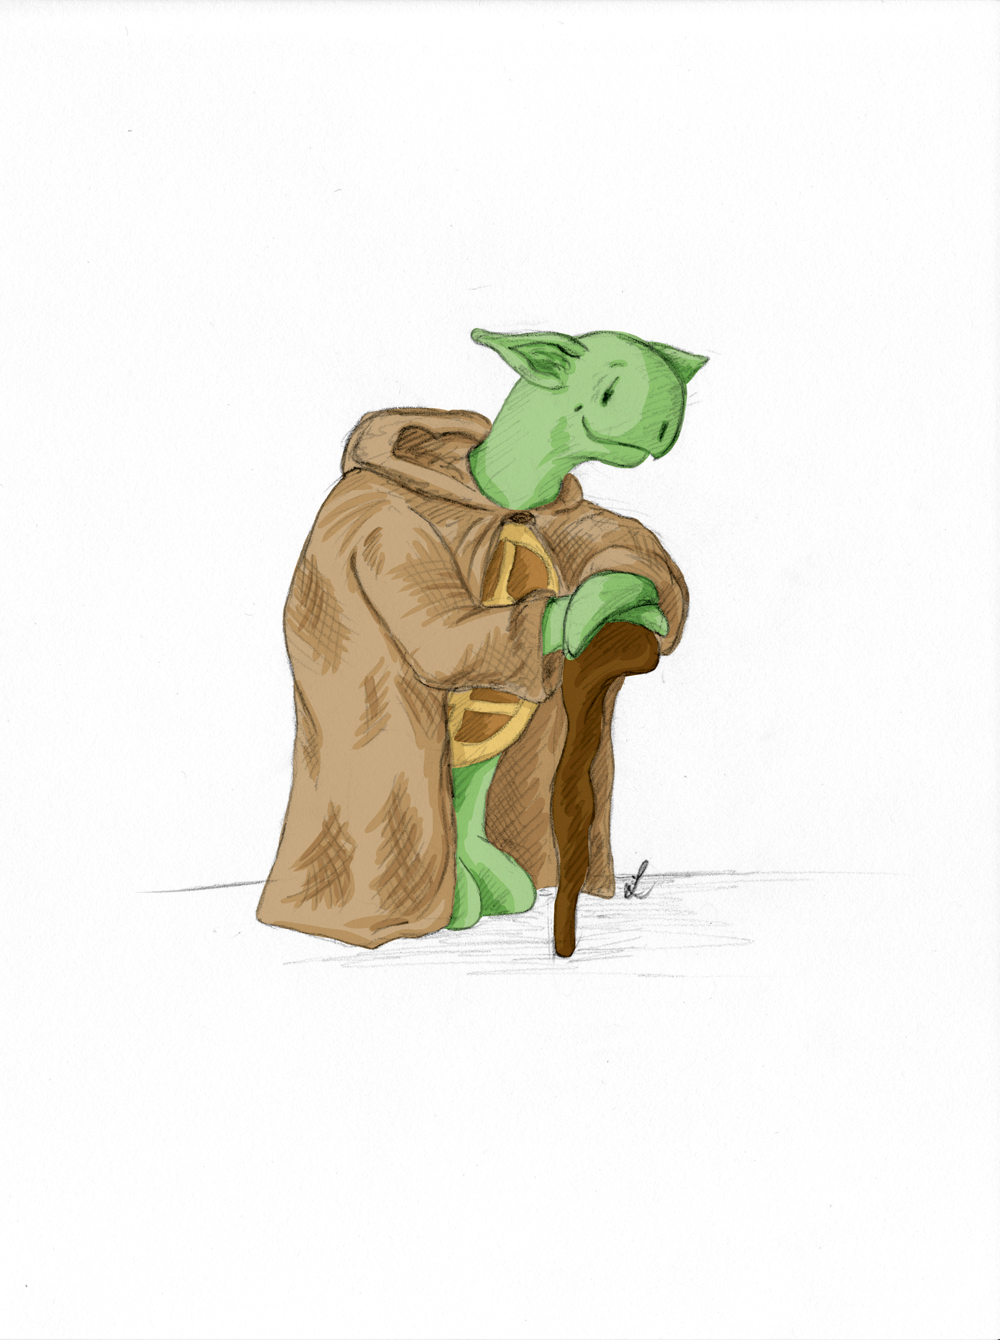 Kröt als Yoda.